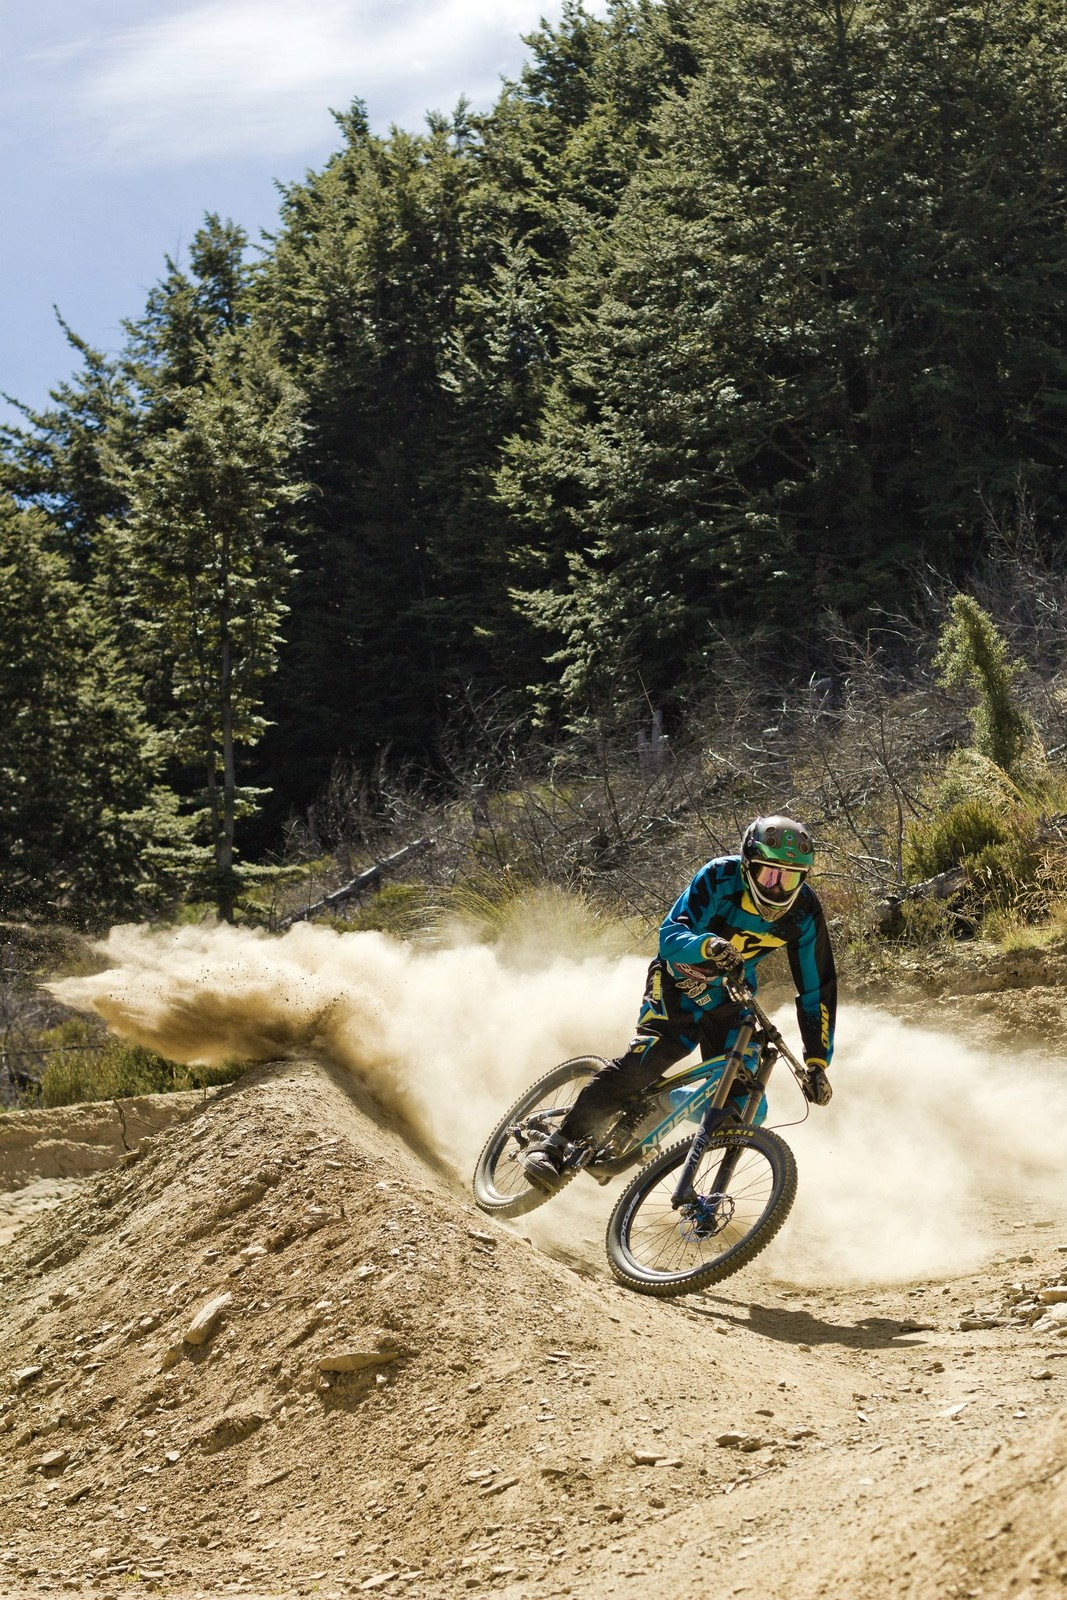 Chris roostin - Banditdh - Mountain Biking Pictures - Vital MTB